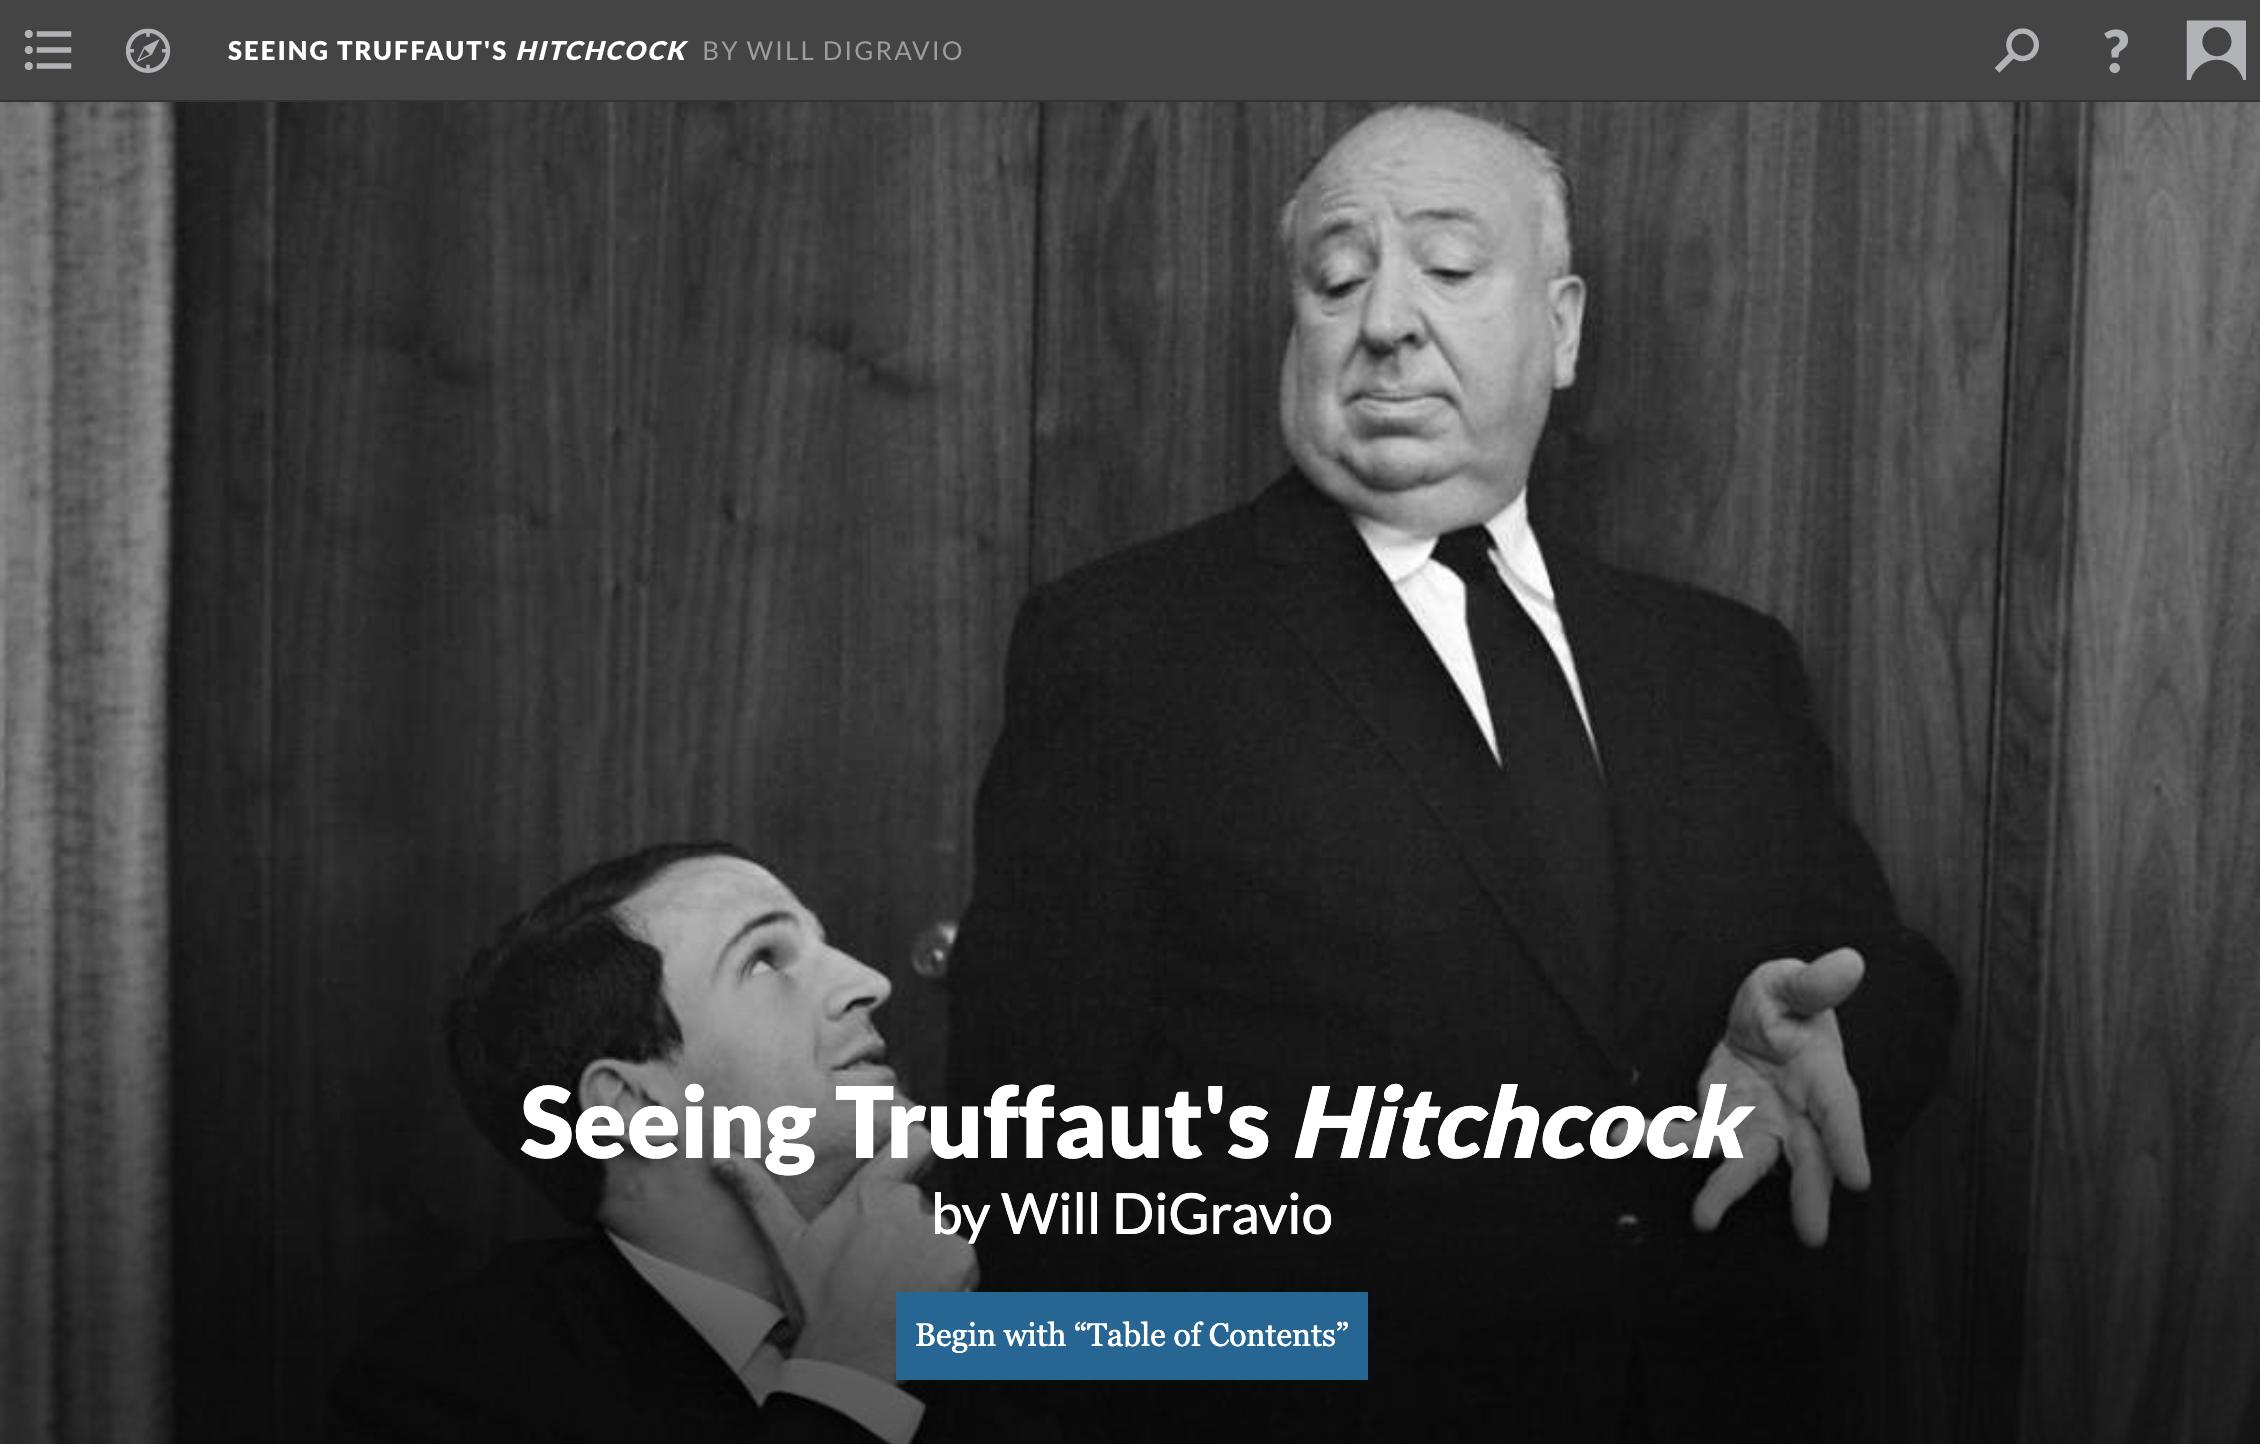 Seeing Truffaut's Hitchcock